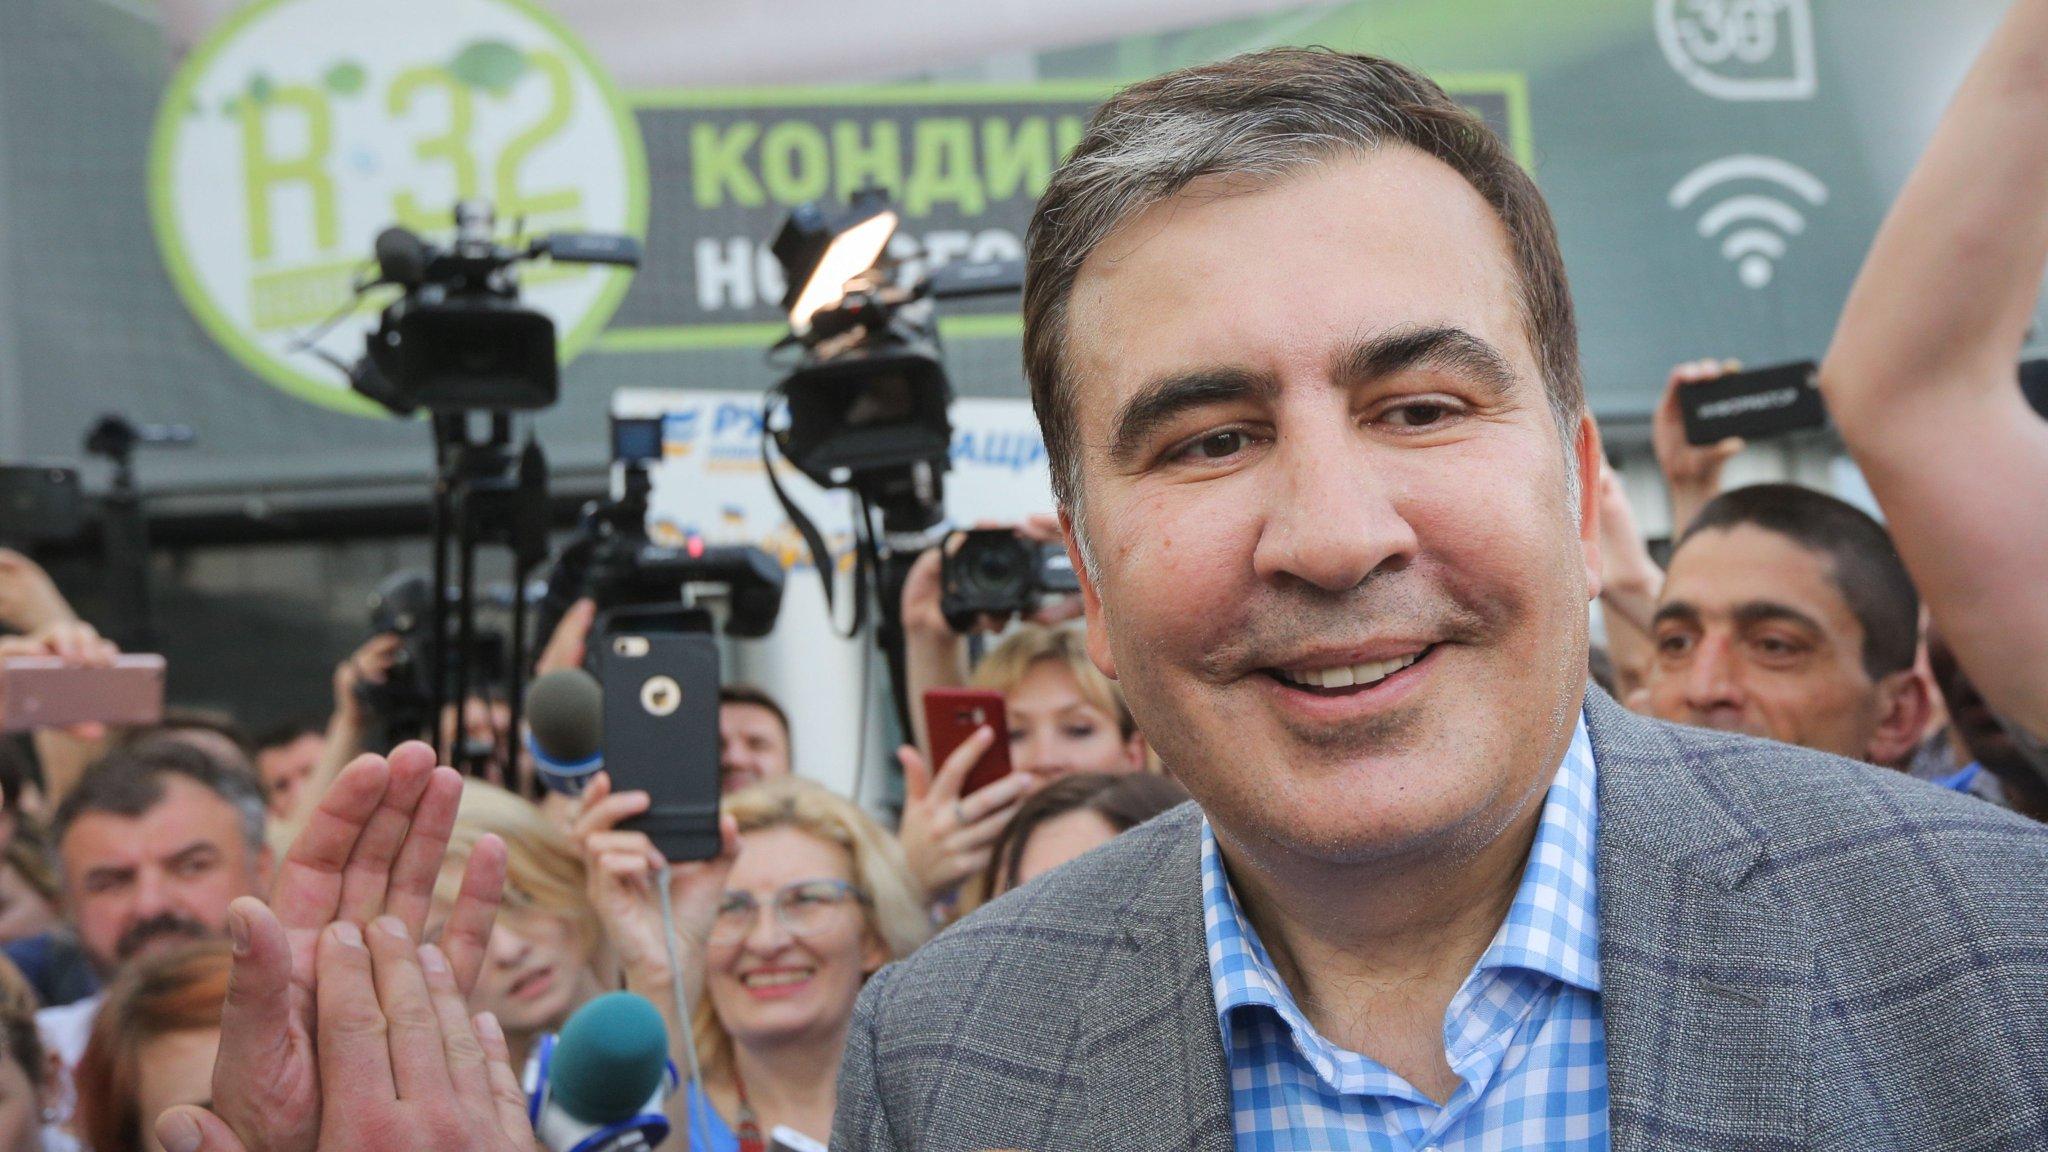 полиции проводятся фото саакашвили на фоне американского флага артистка юмором